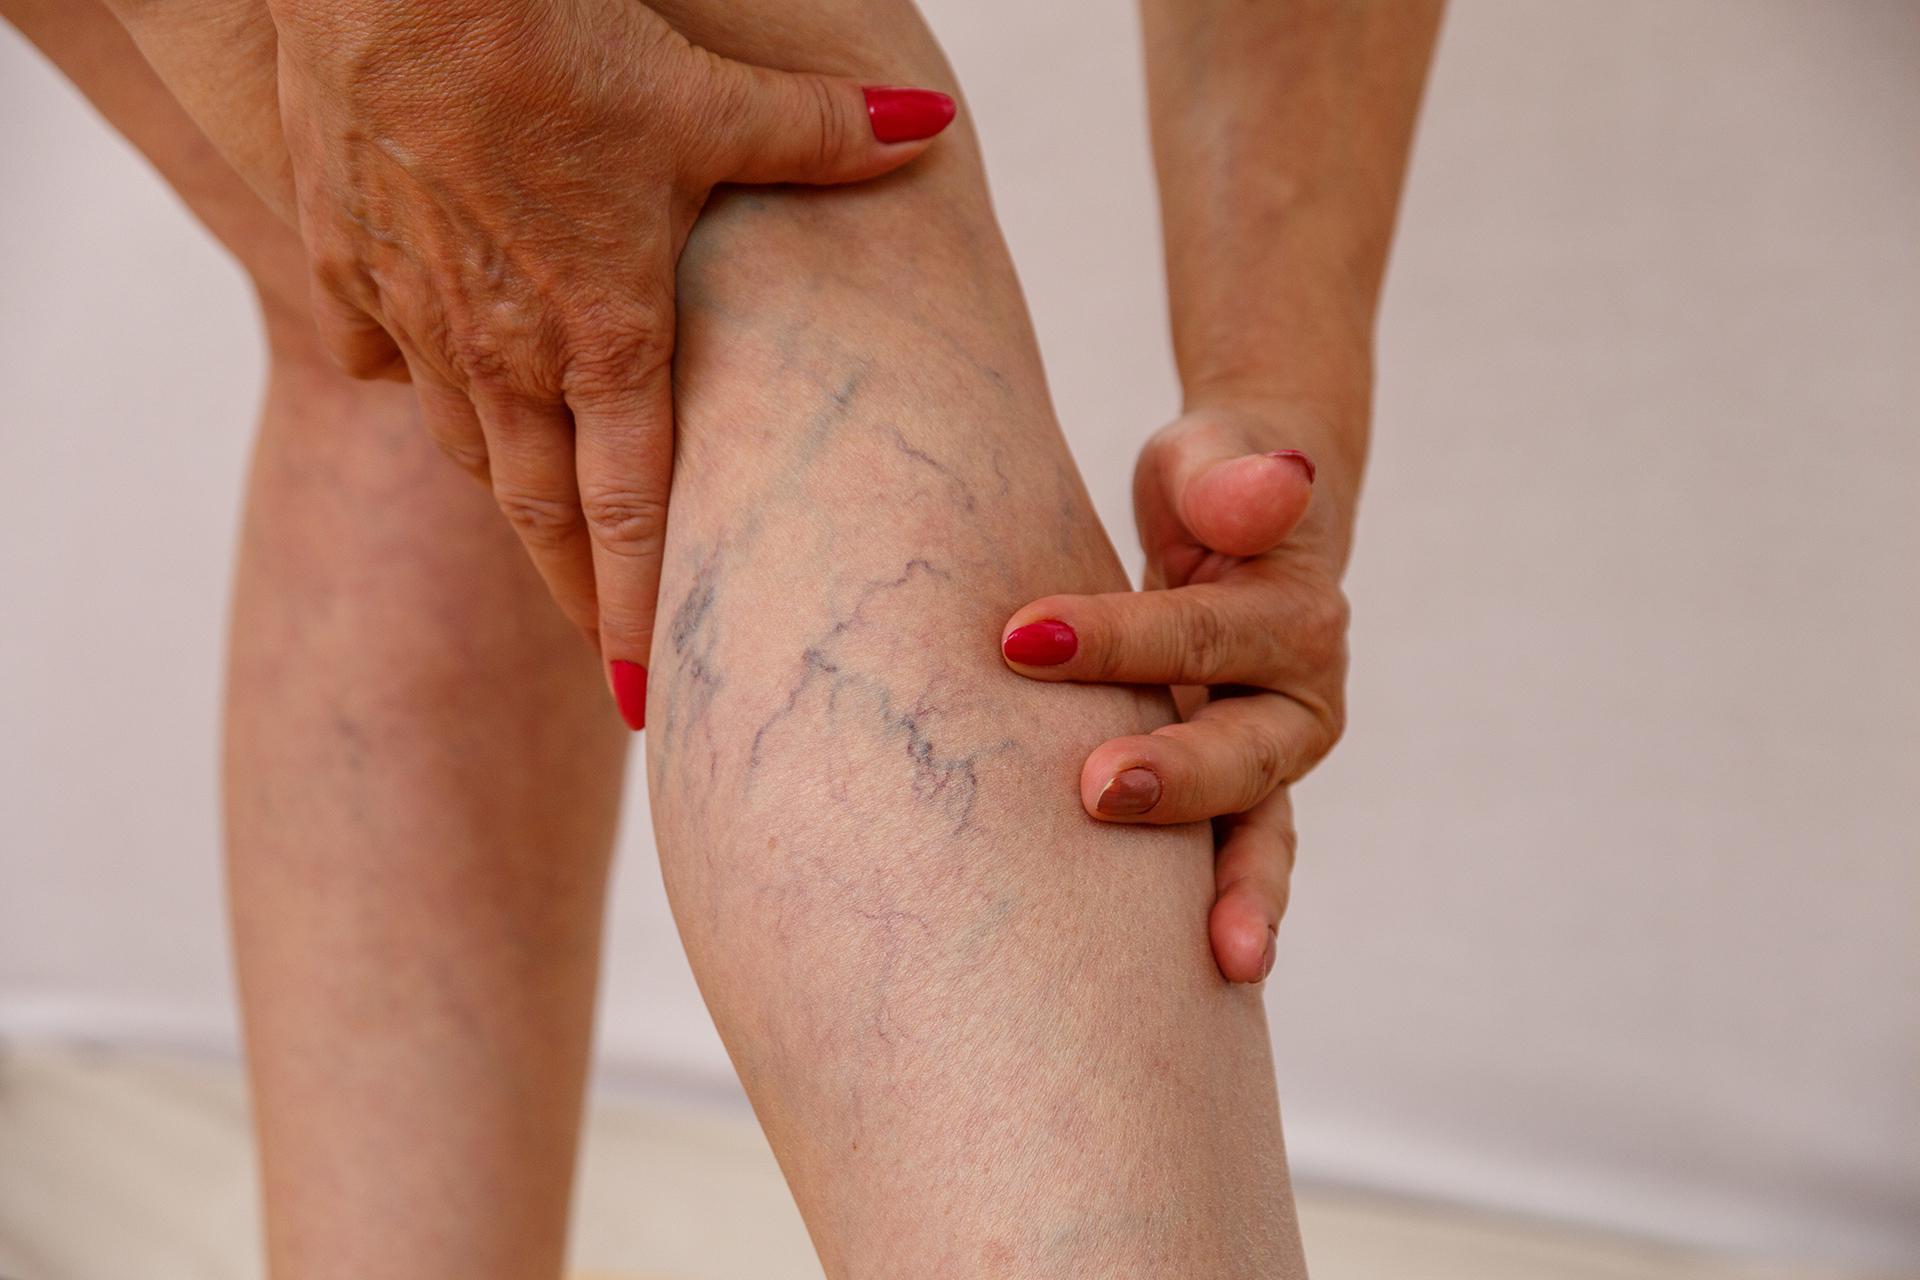 vascular-issues-requiring-leg-pain-doctor-Sunland